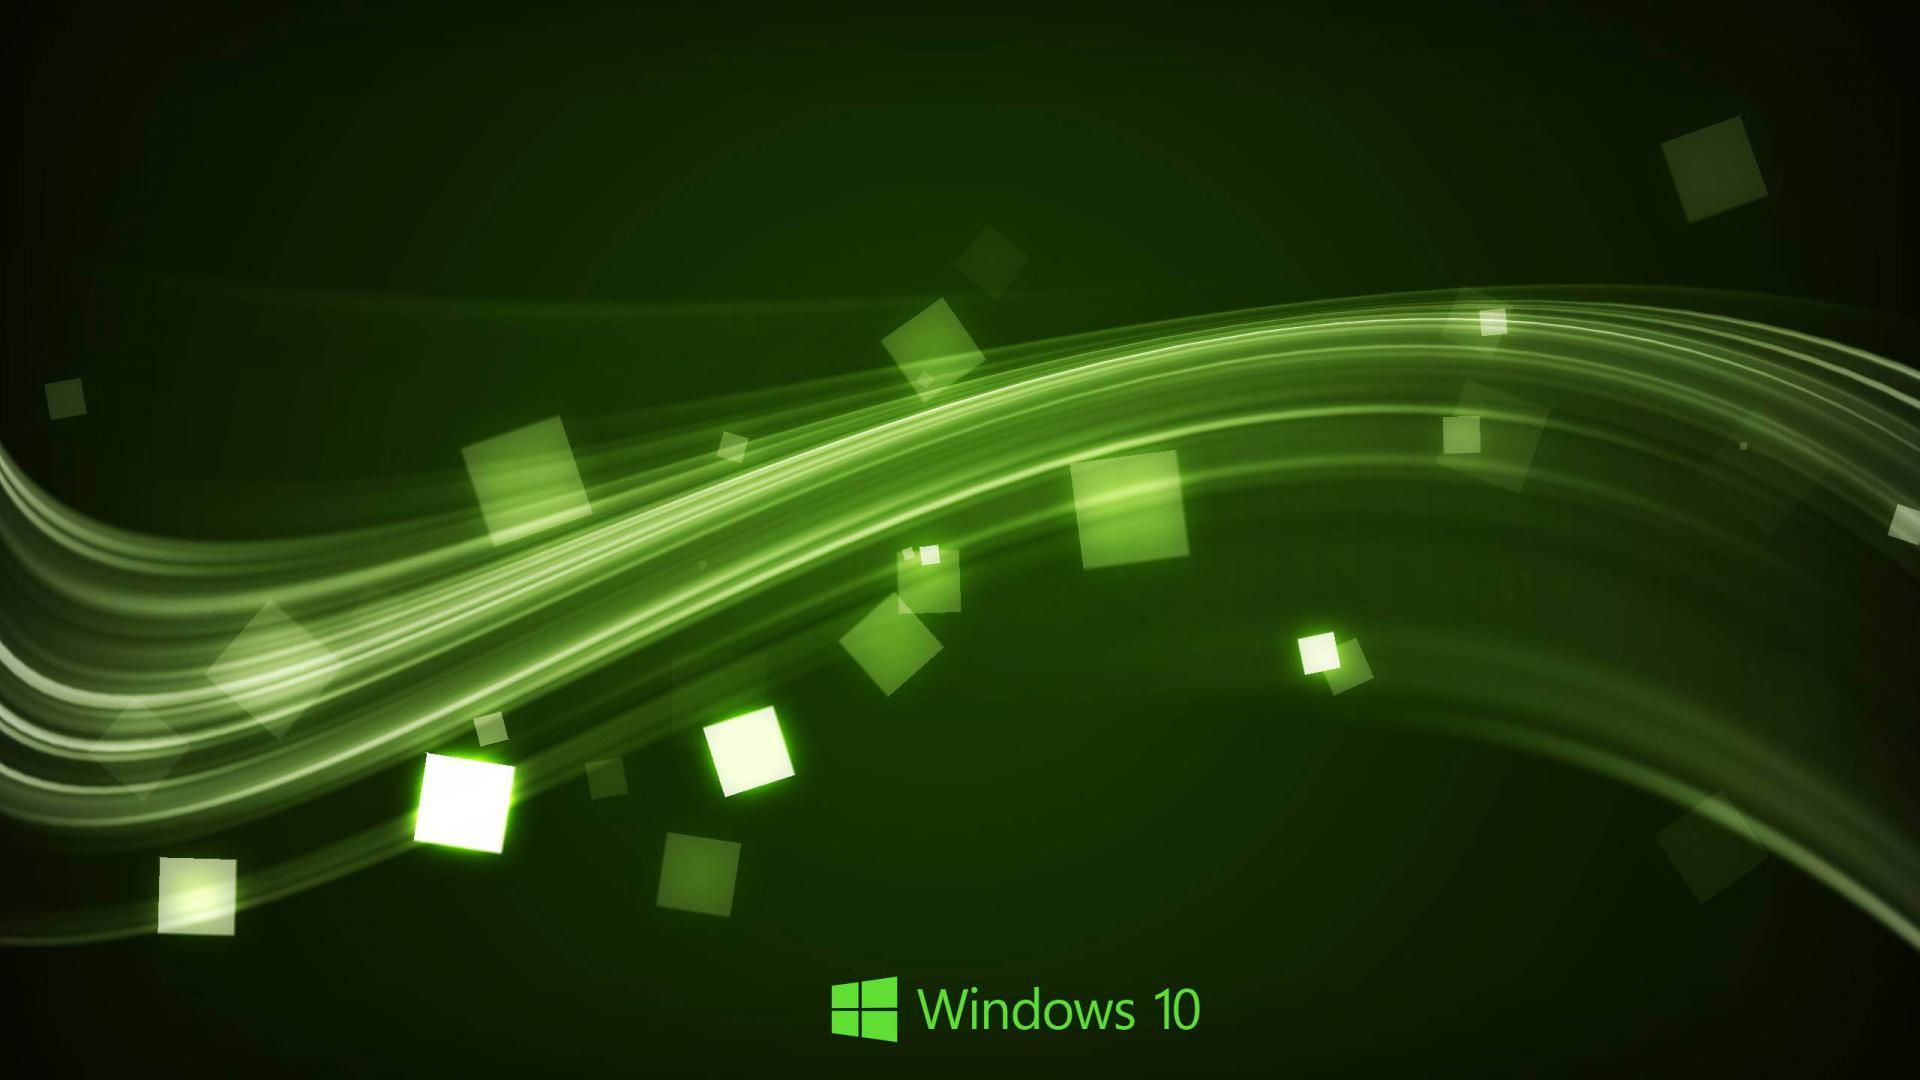 10 desktop windows wallpaper wallpaper for windows 10 Windows 10 1920x1080